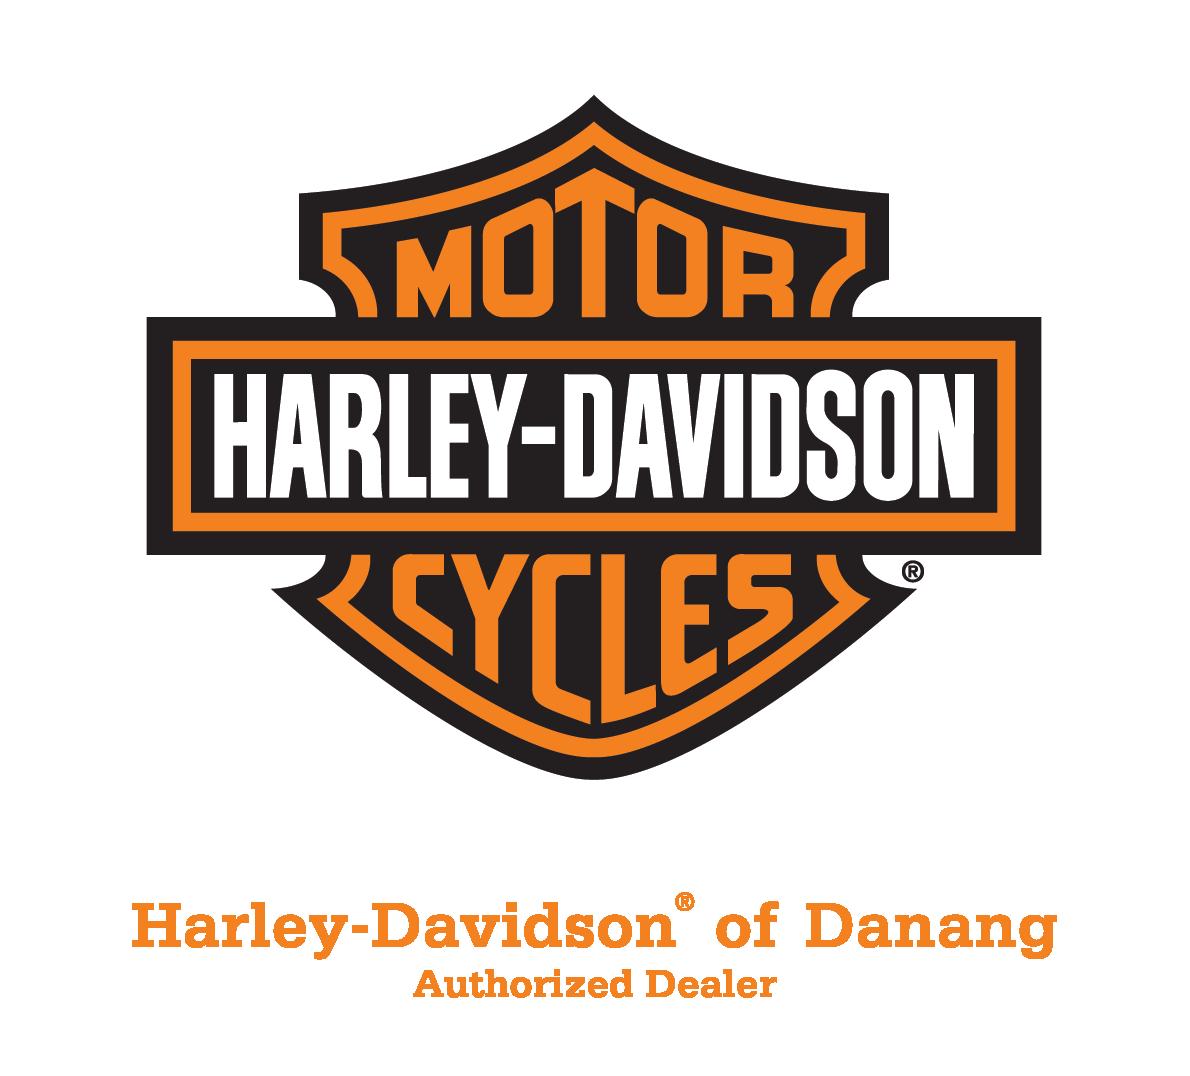 Harley-Davidson<sup>&reg;</sup> of Danang